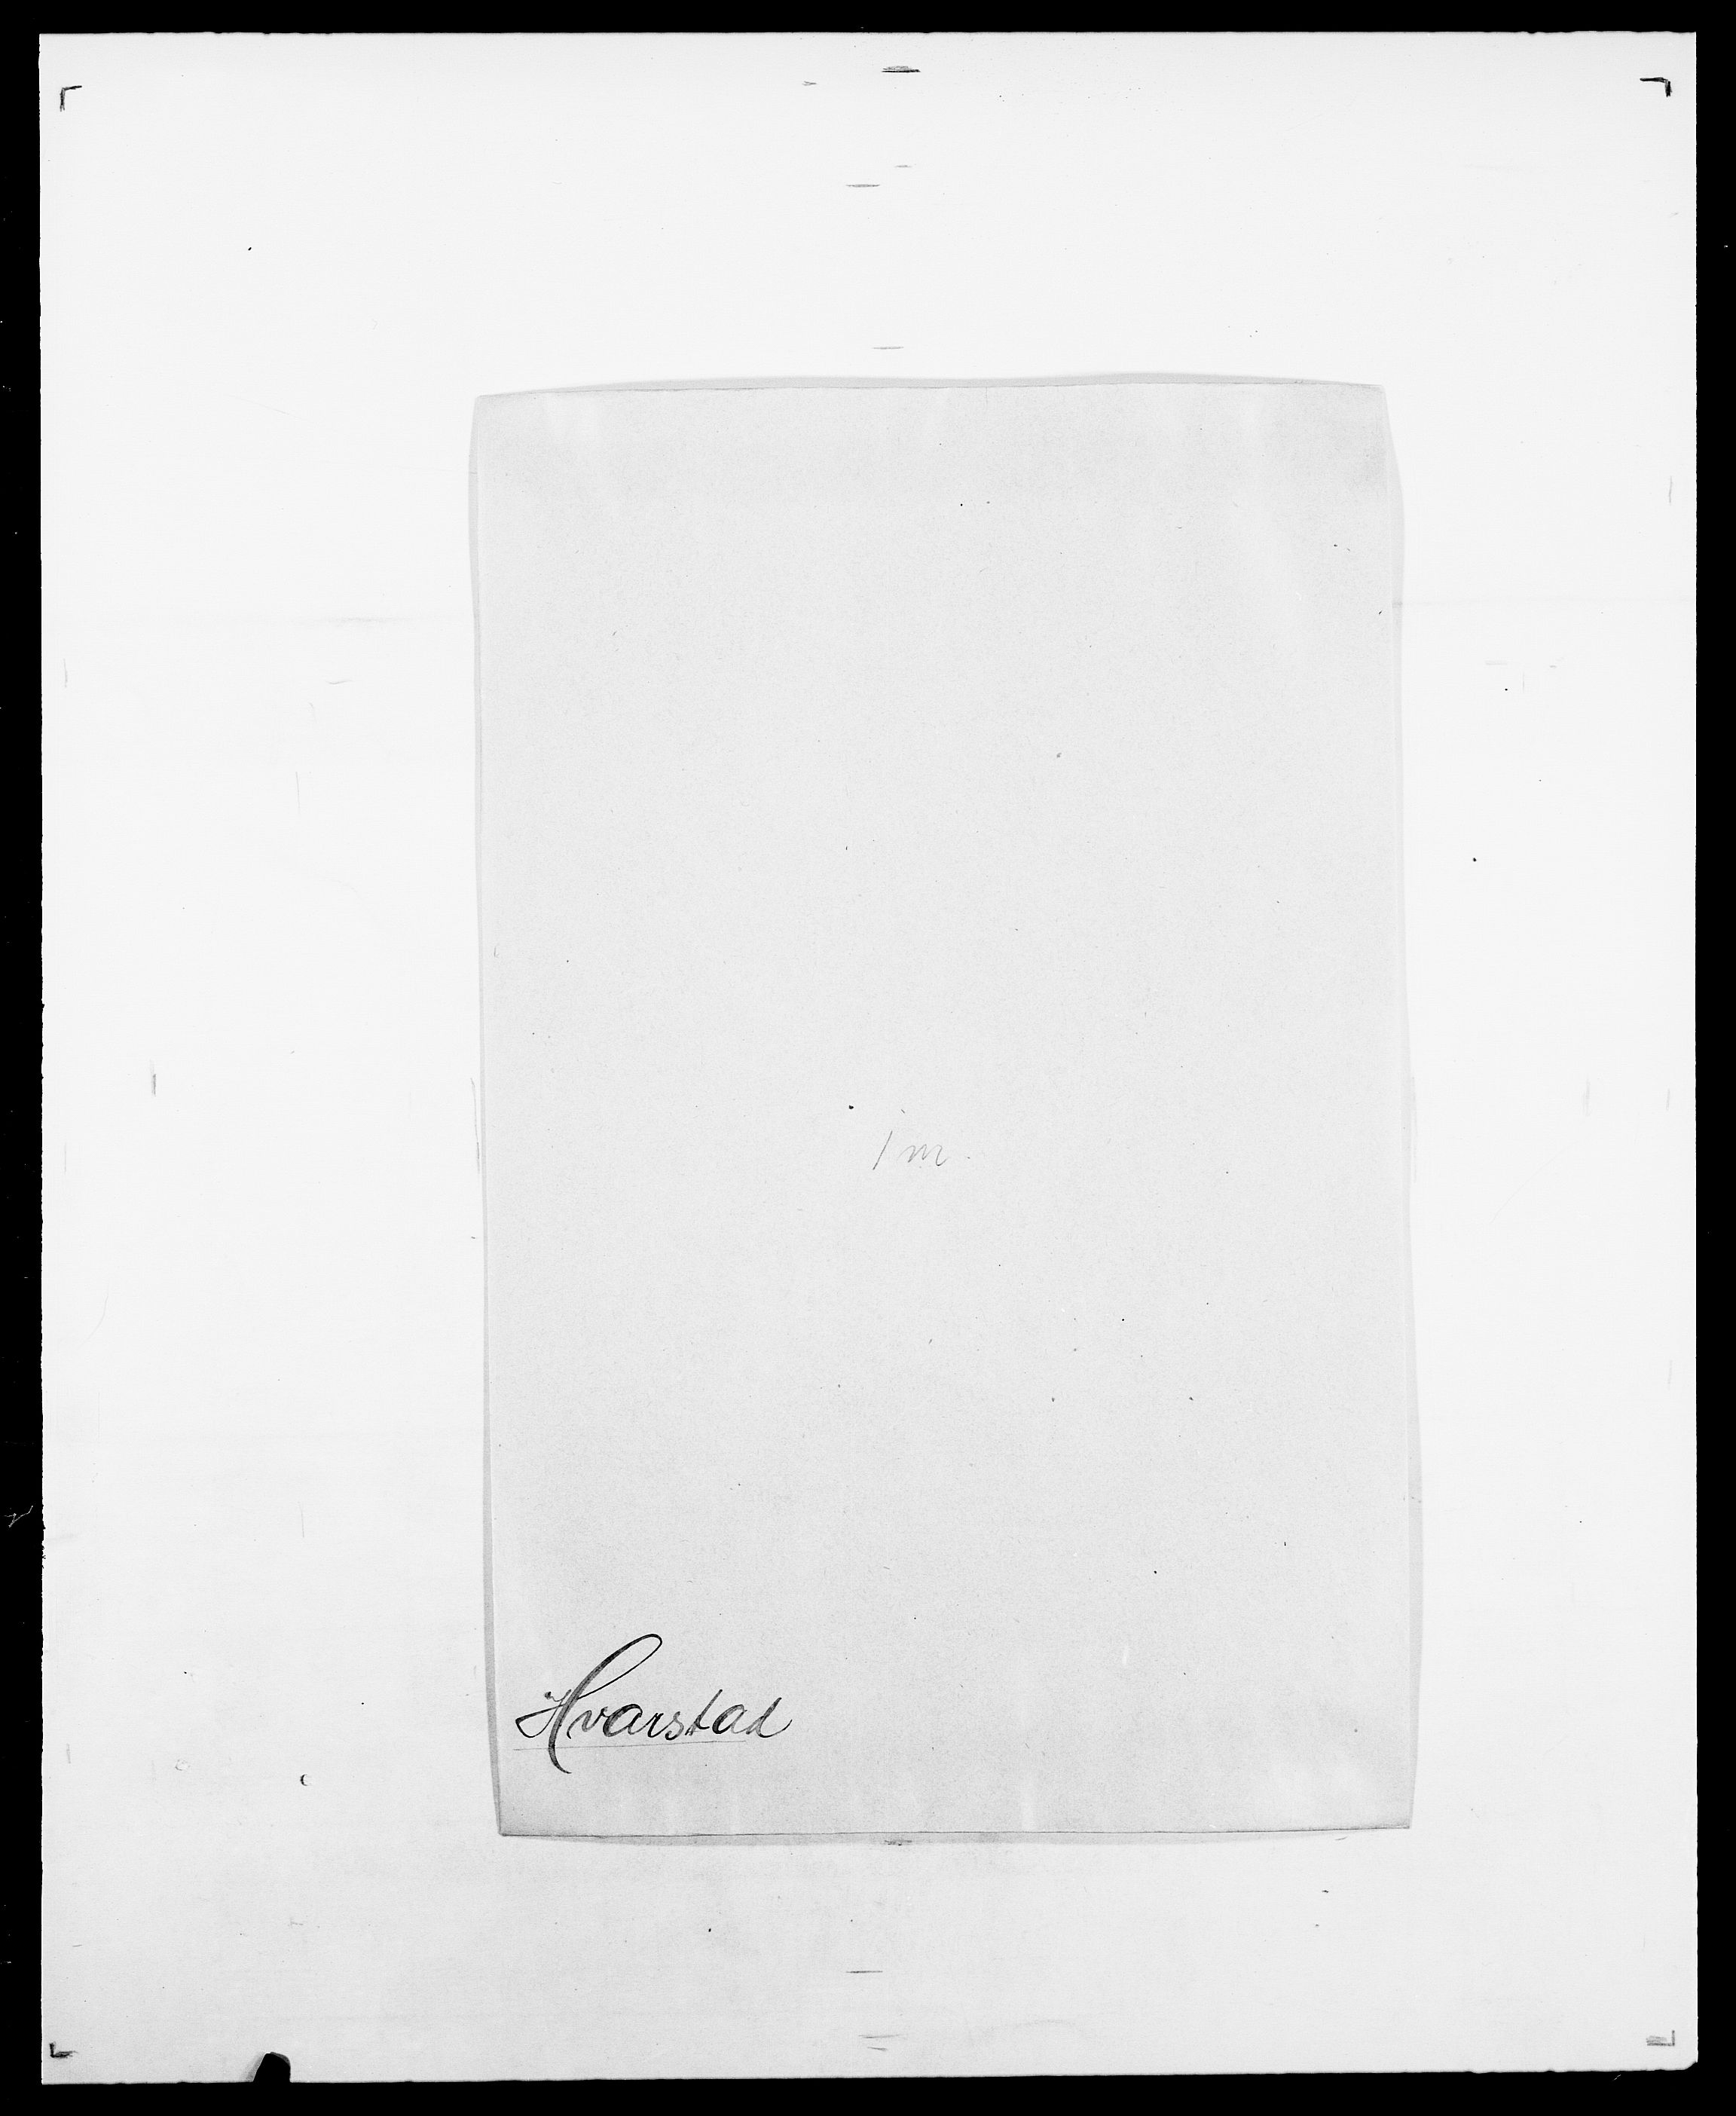 SAO, Delgobe, Charles Antoine - samling, D/Da/L0019: van der Hude - Joys, s. 121